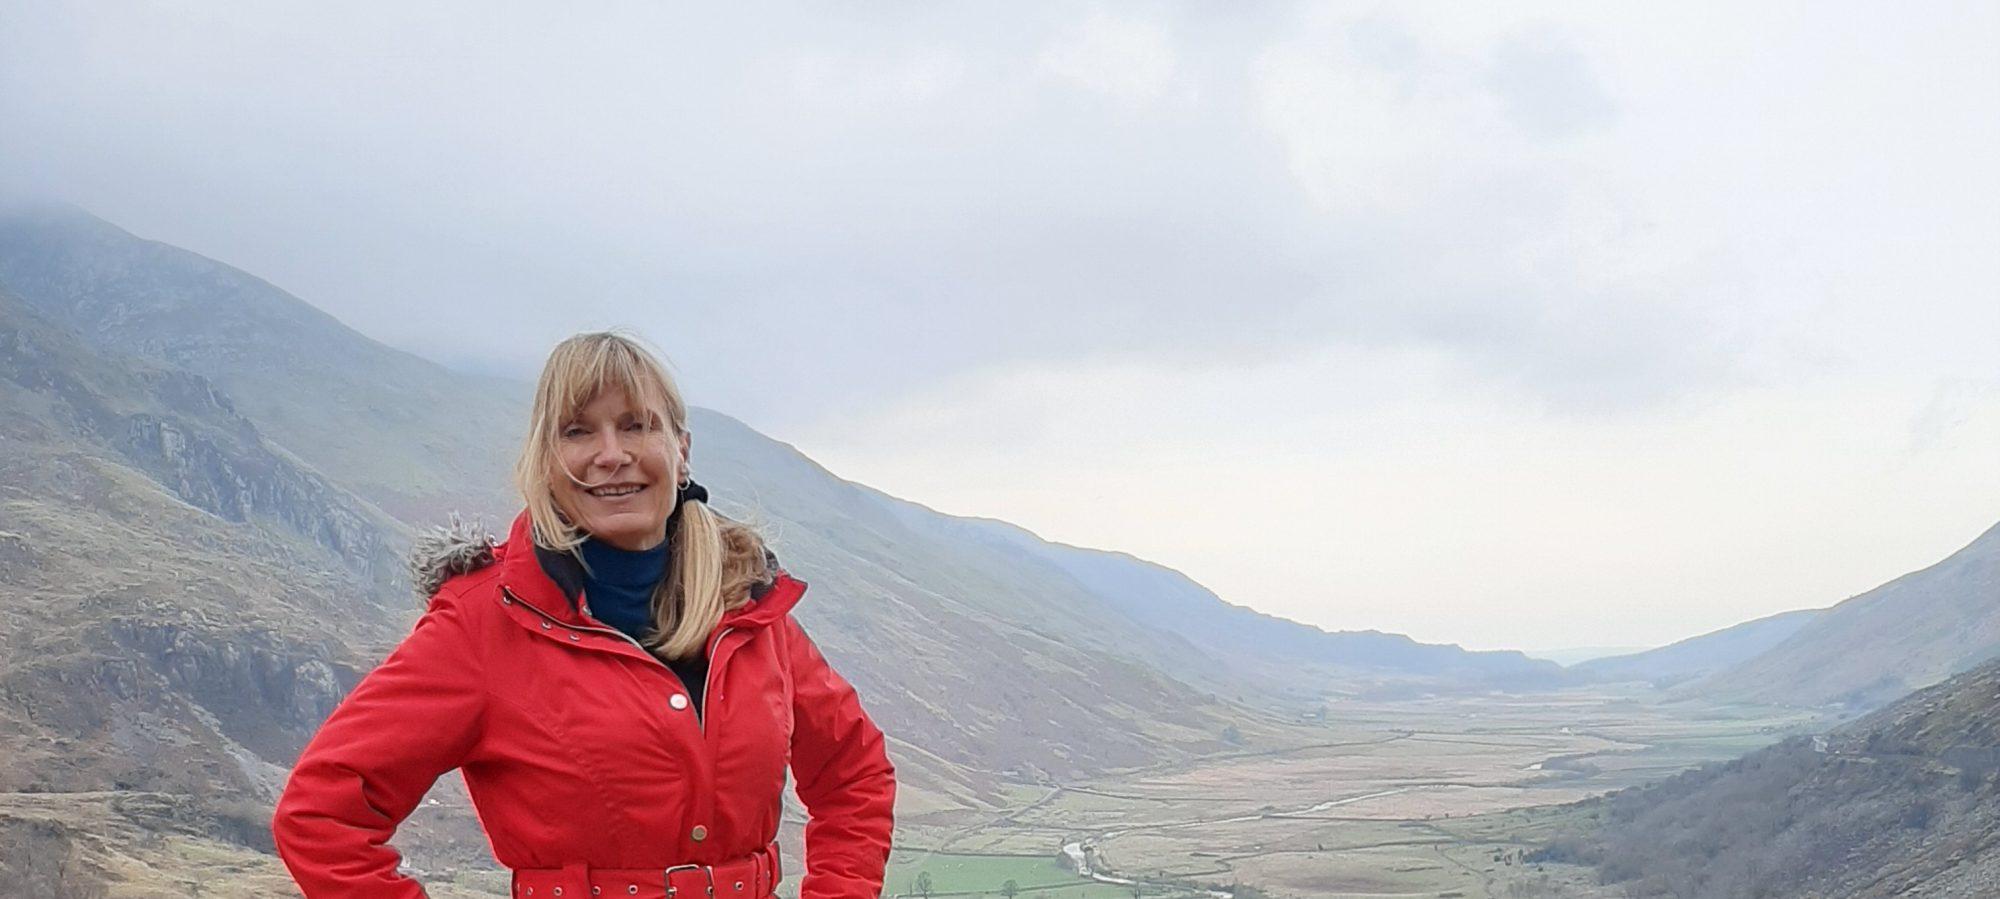 Dr. Katrin Dreyer-Gibney